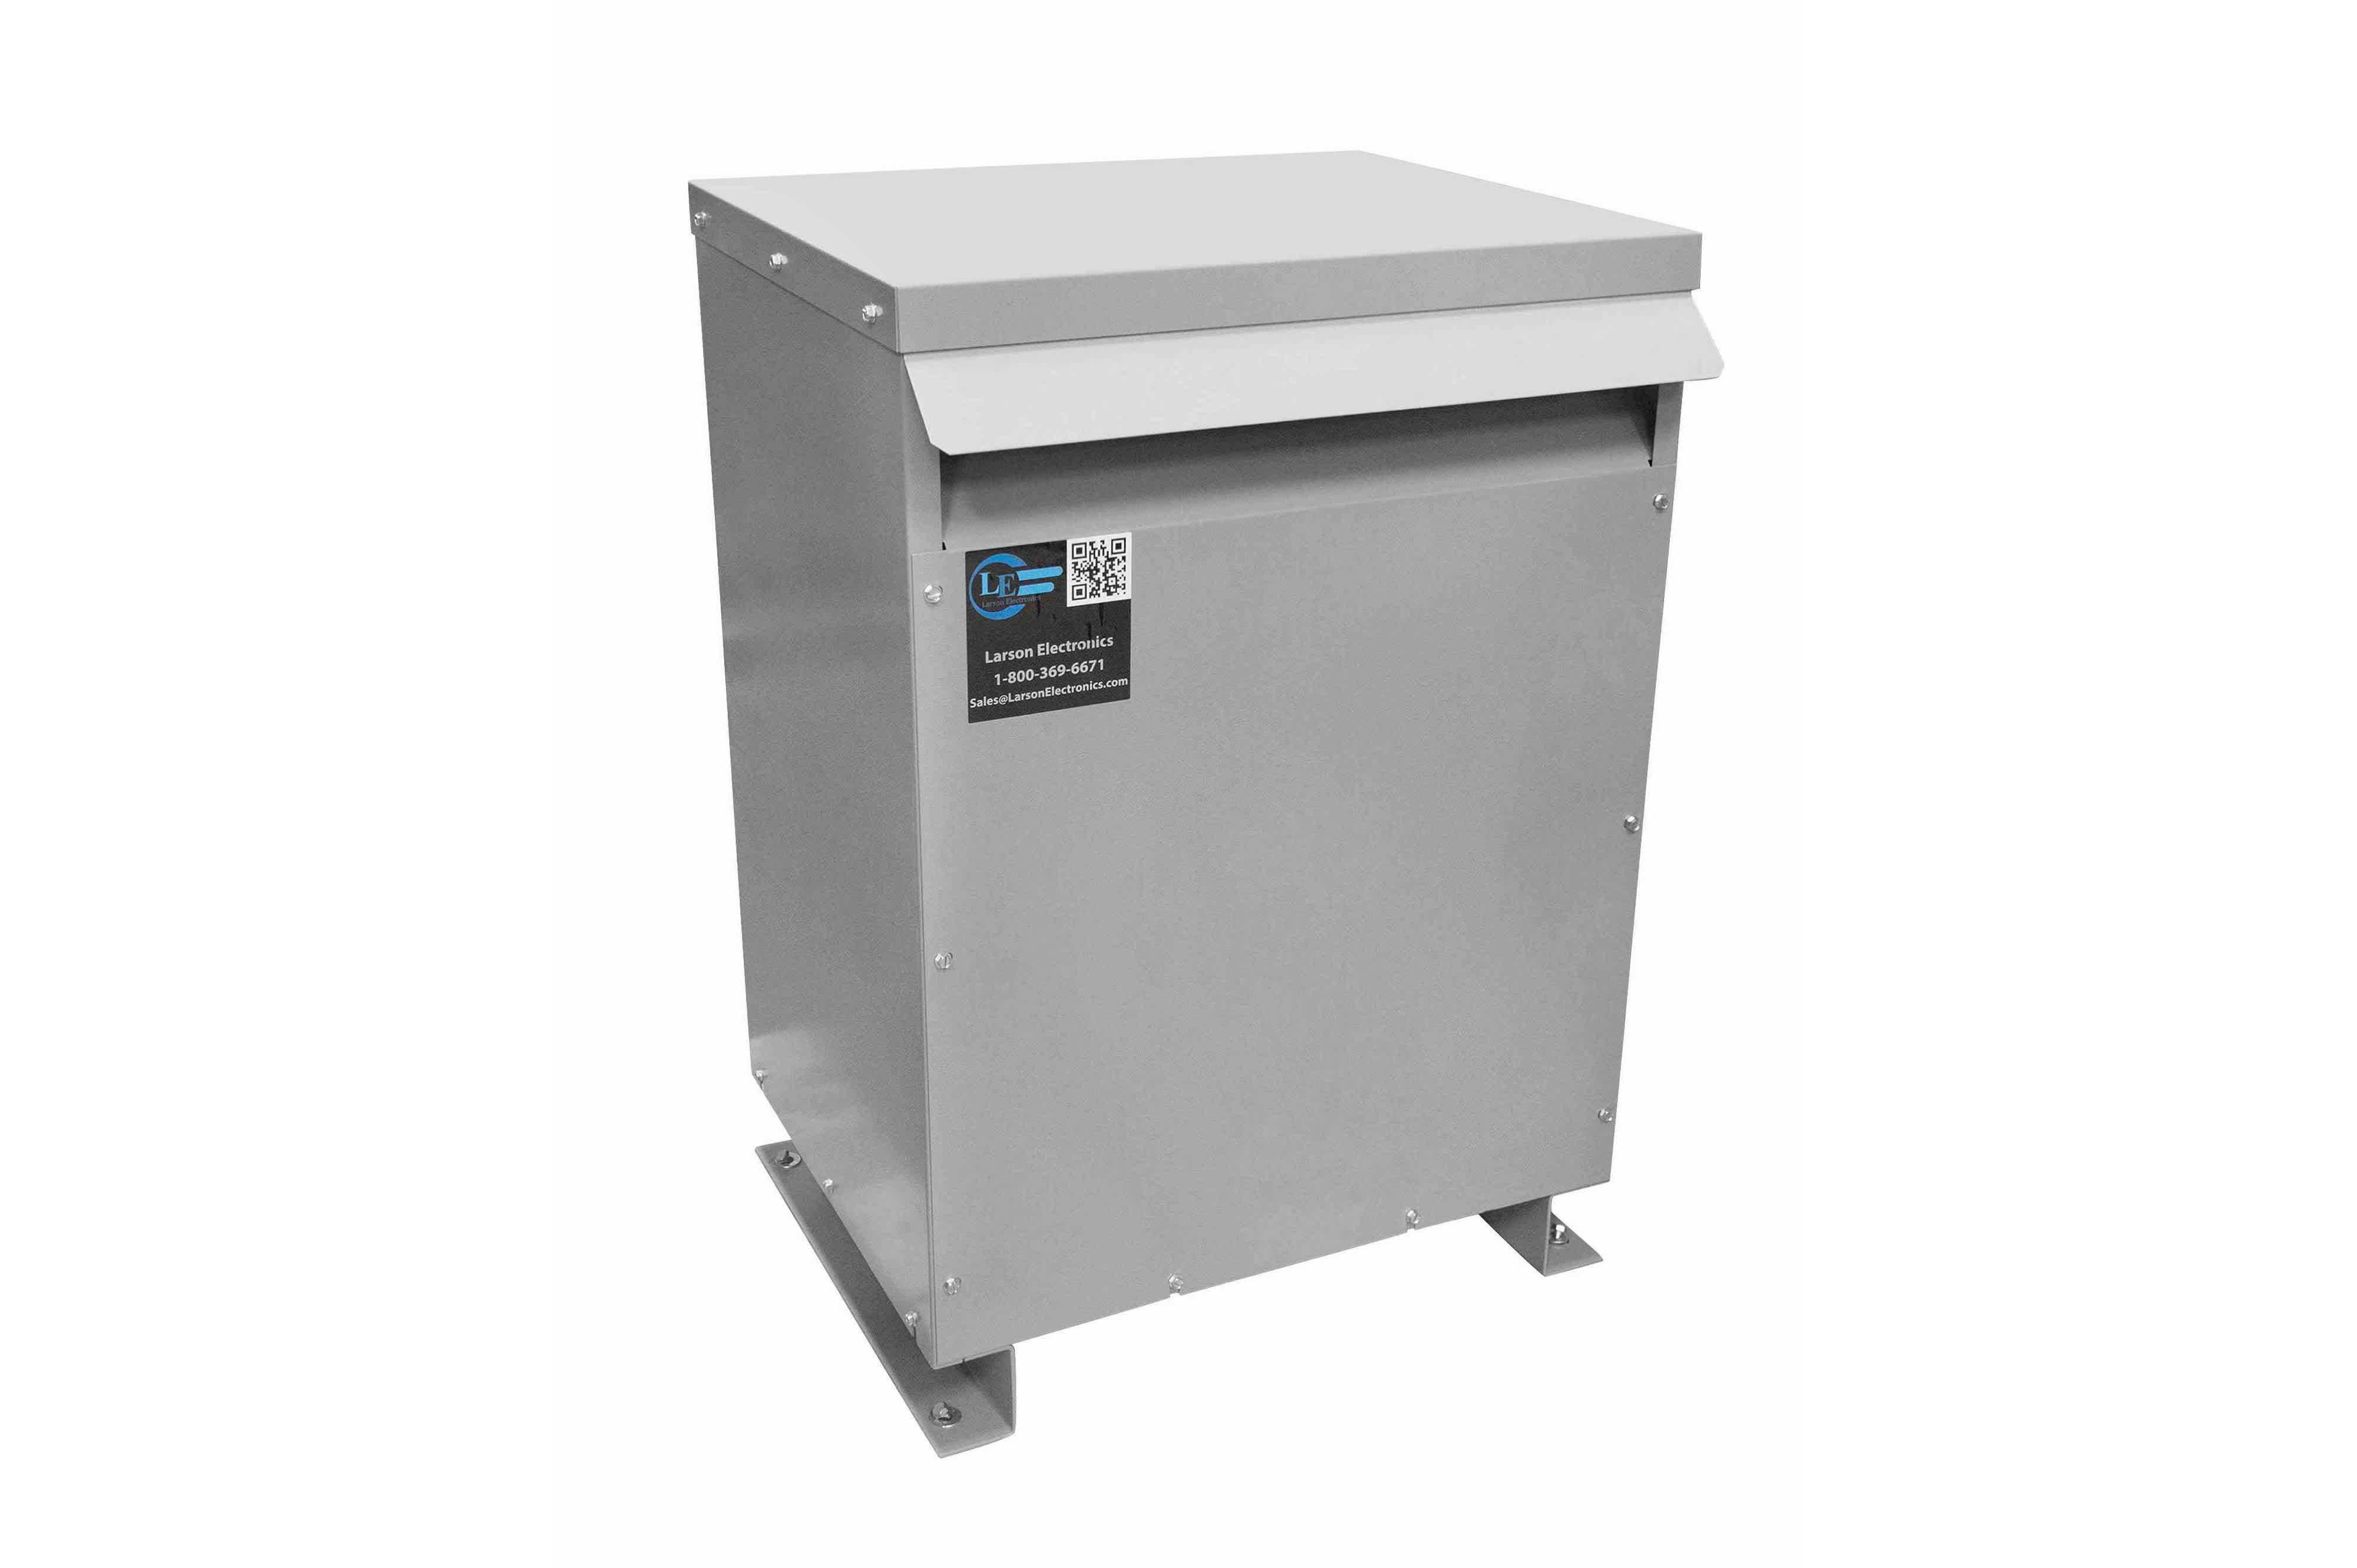 1000 kVA 3PH Isolation Transformer, 240V Wye Primary, 600V Delta Secondary, N3R, Ventilated, 60 Hz